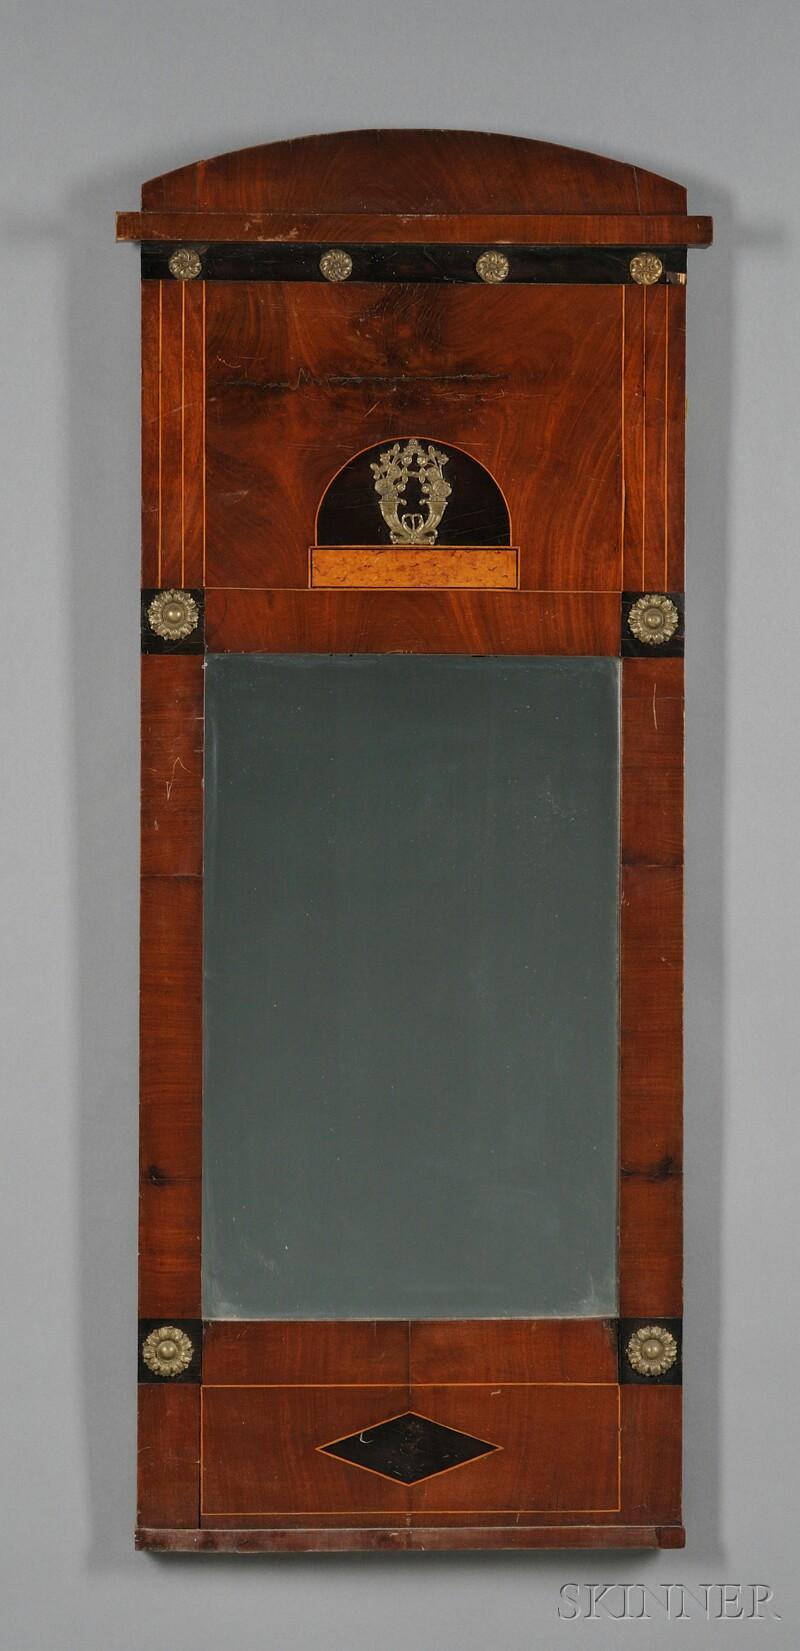 Biedermeier-style Mahogany Veneer, Inlaid, and Brass-mounted Mirror